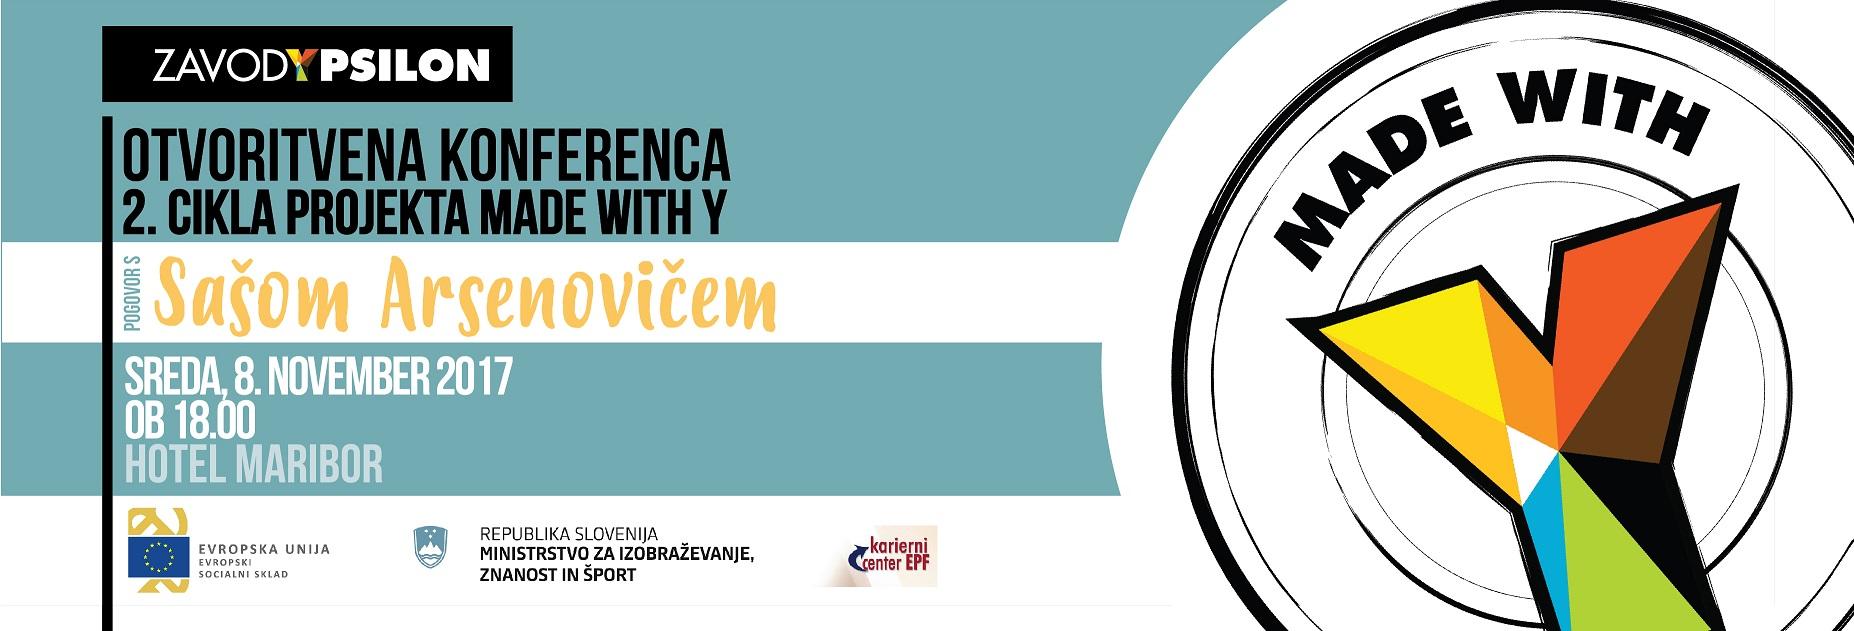 mwy1 mb otvoritvena konferenca sasa arsenovic small